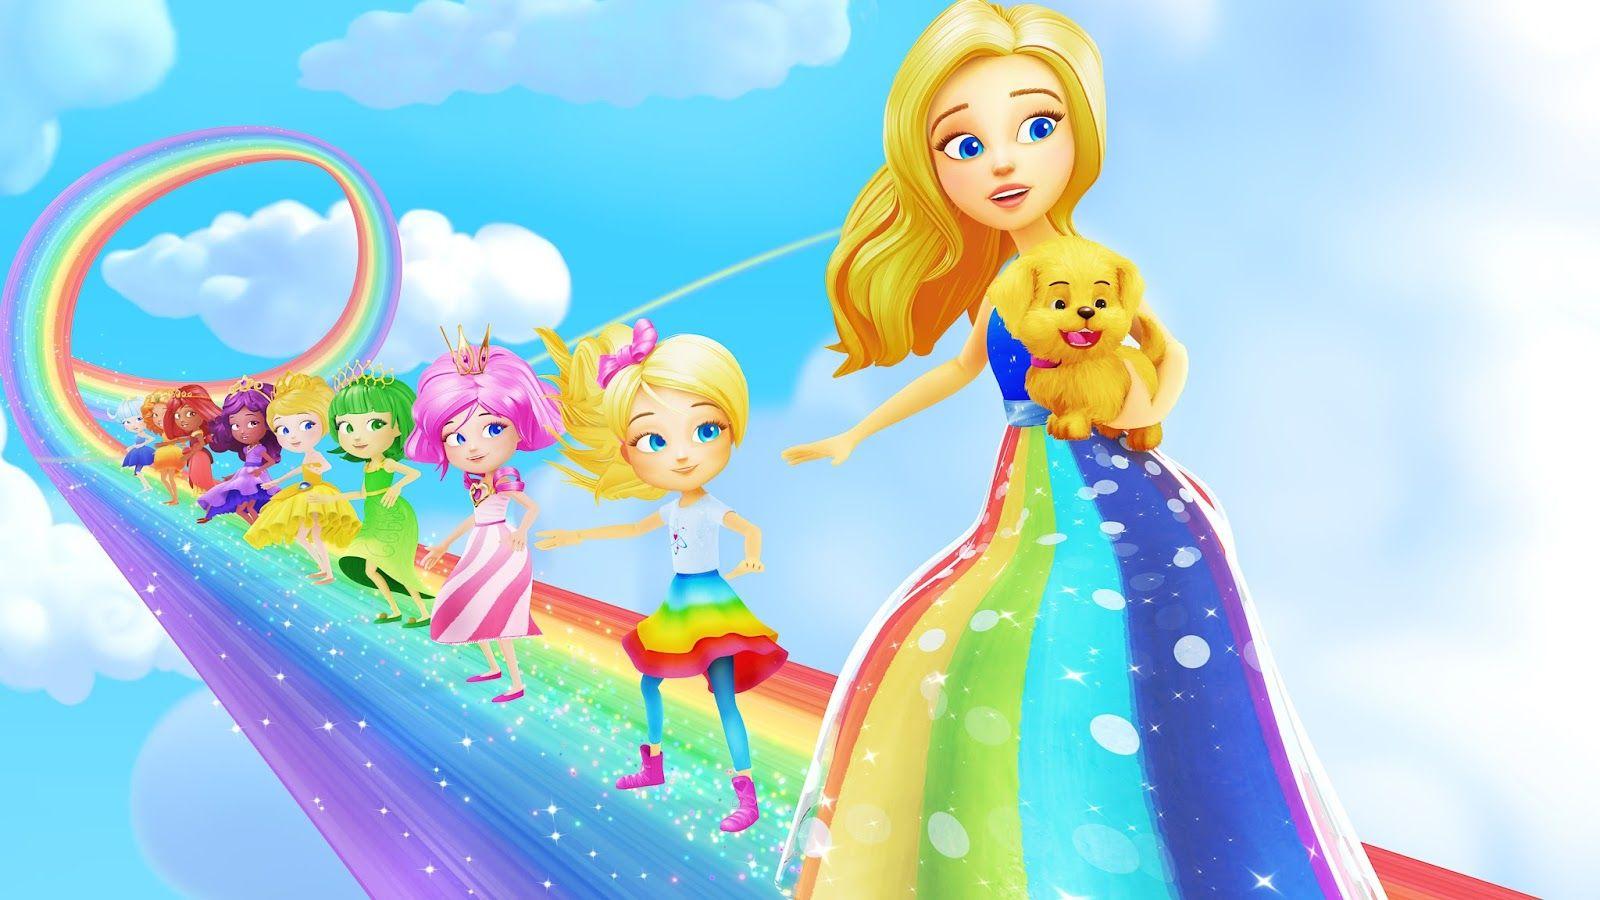 Nett Juegos De Barbie Para Vestir De Novia Bilder - Brautkleider ...